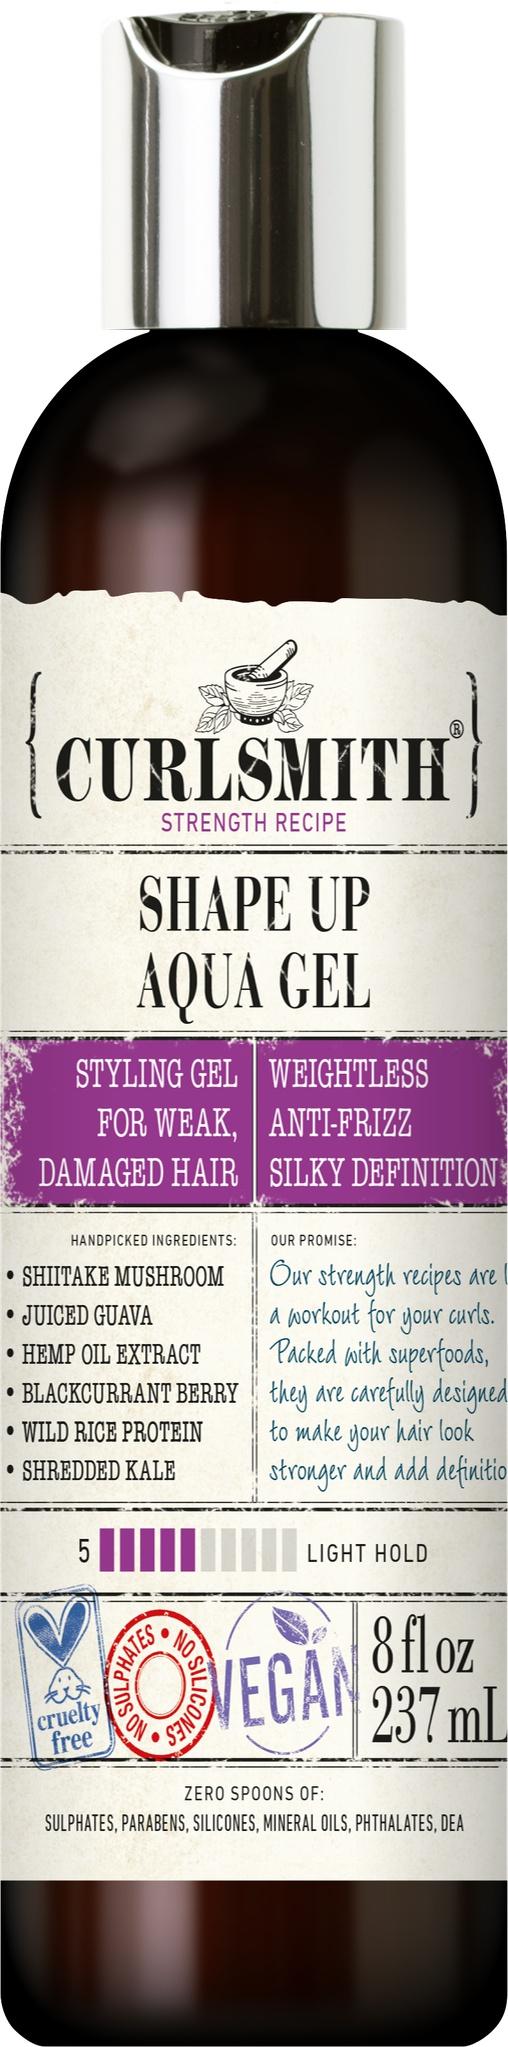 Curlsmith Shape Up Aqua Gel